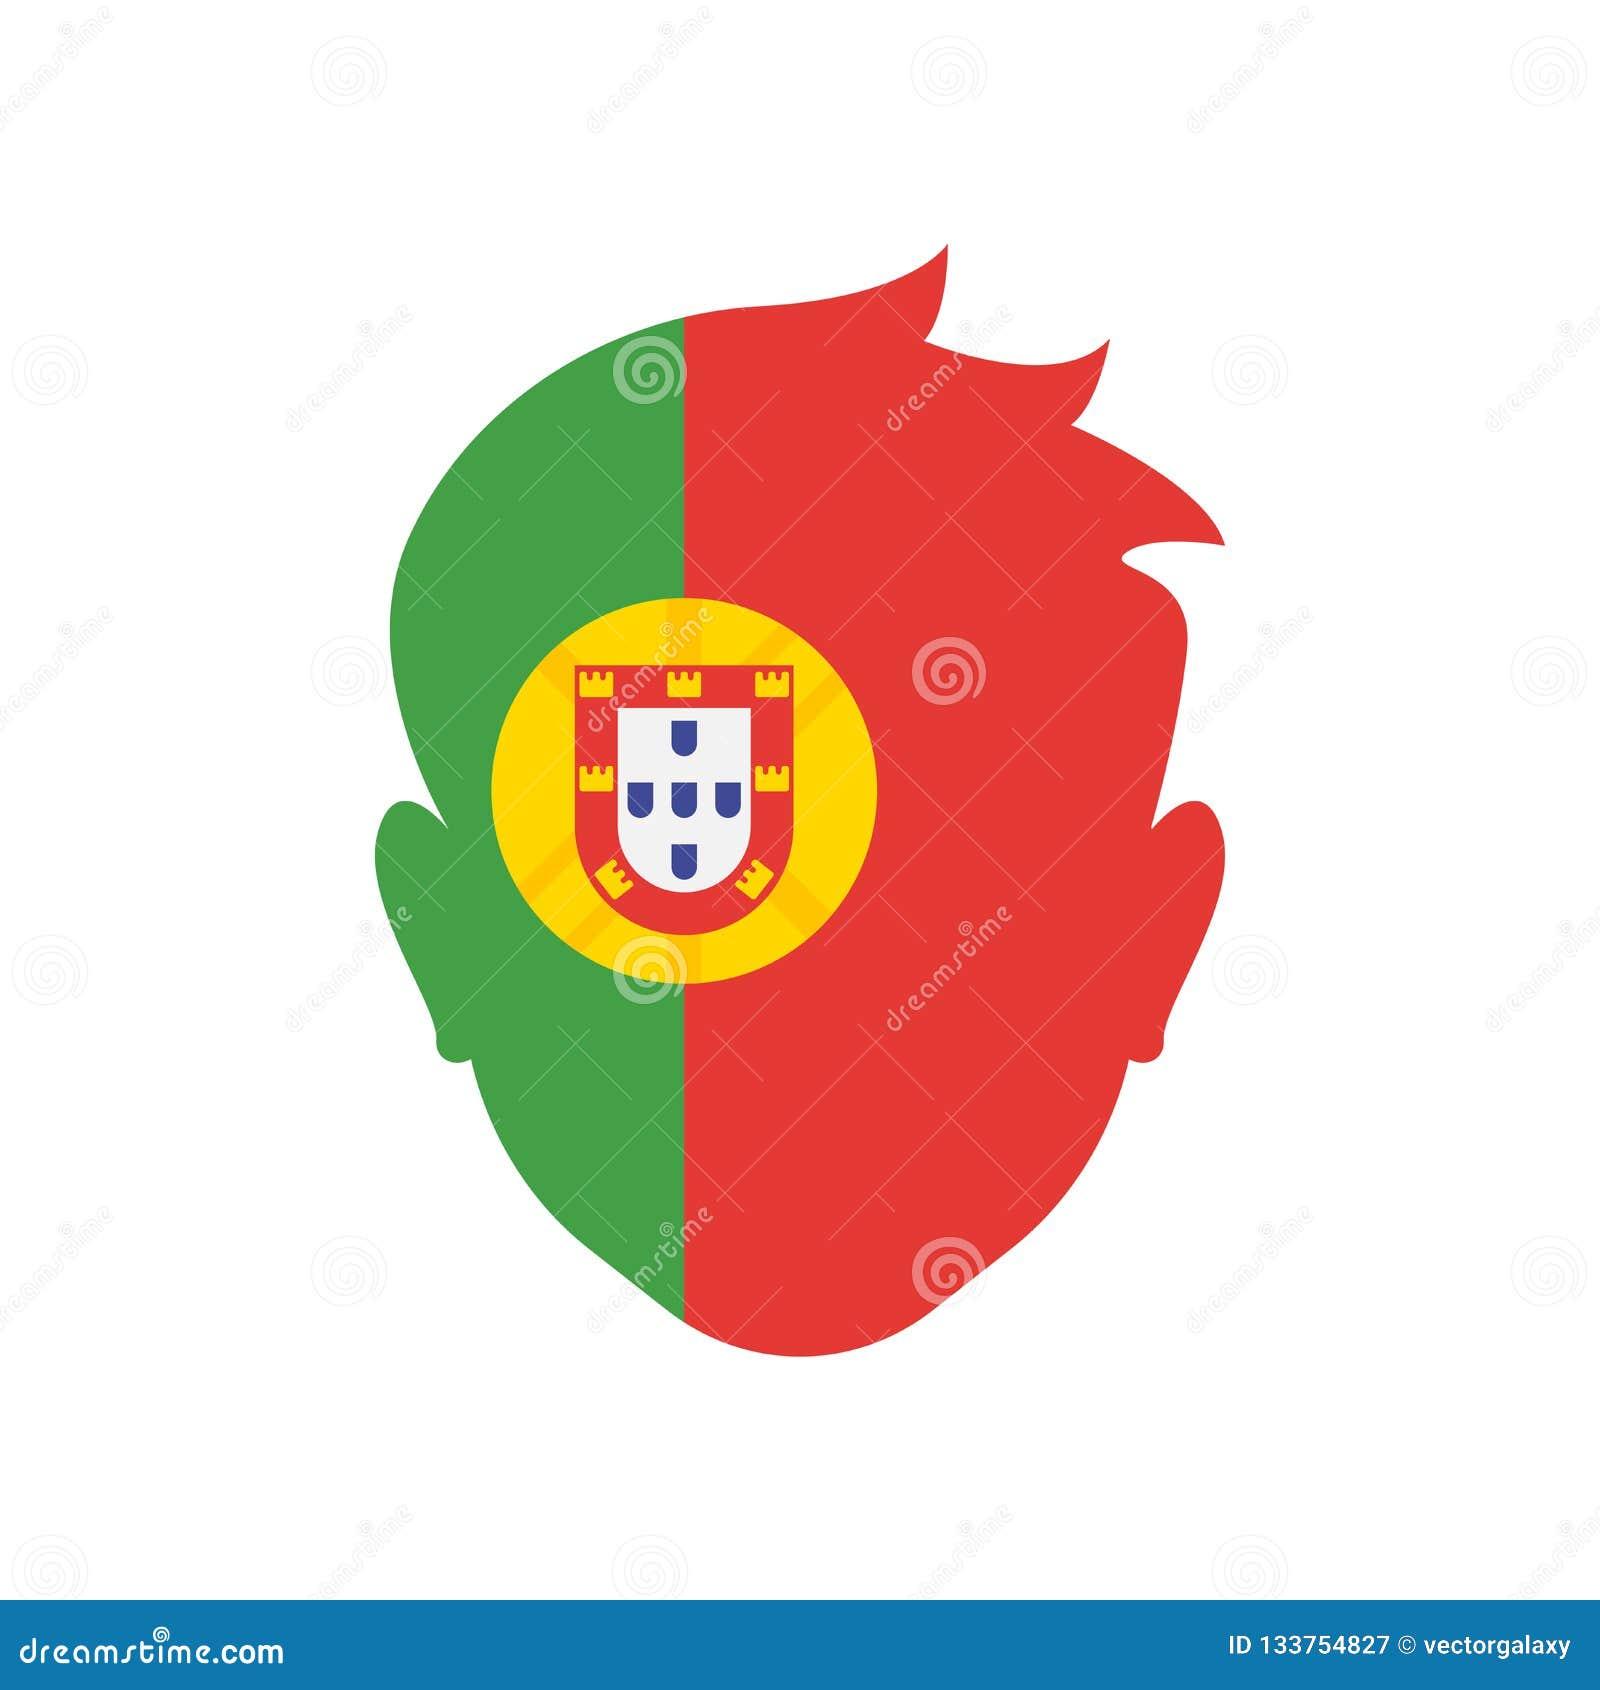 Sinal e símbolo do vetor do ícone de Portugal isolados no backgroun branco